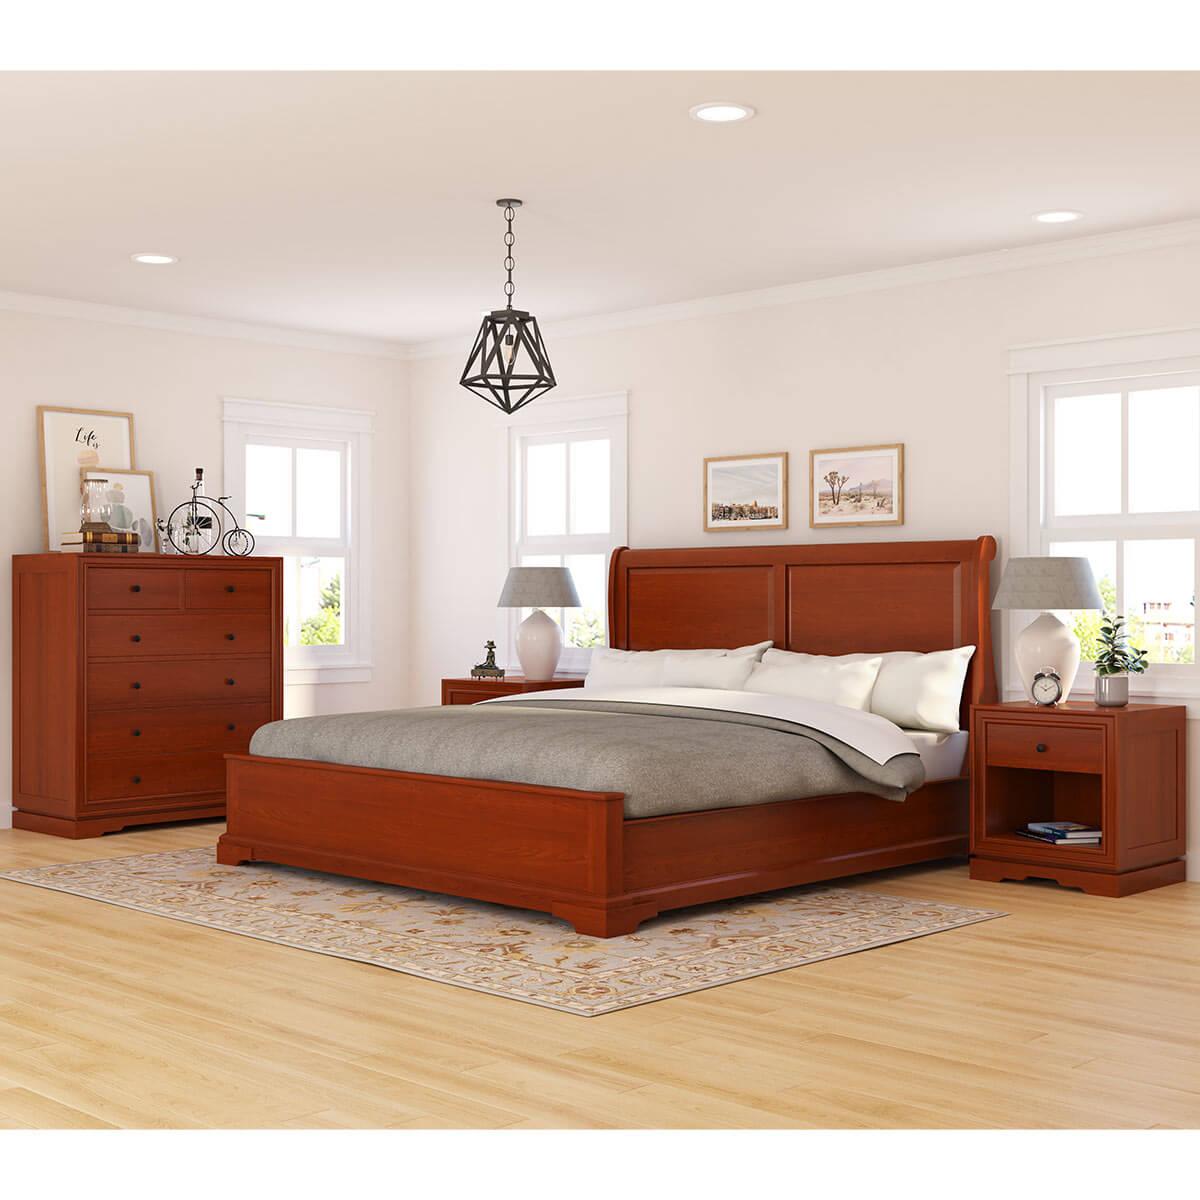 Awe Inspiring Duanesburg Mahogany Wood 4 Piece Bedroom Set Download Free Architecture Designs Scobabritishbridgeorg